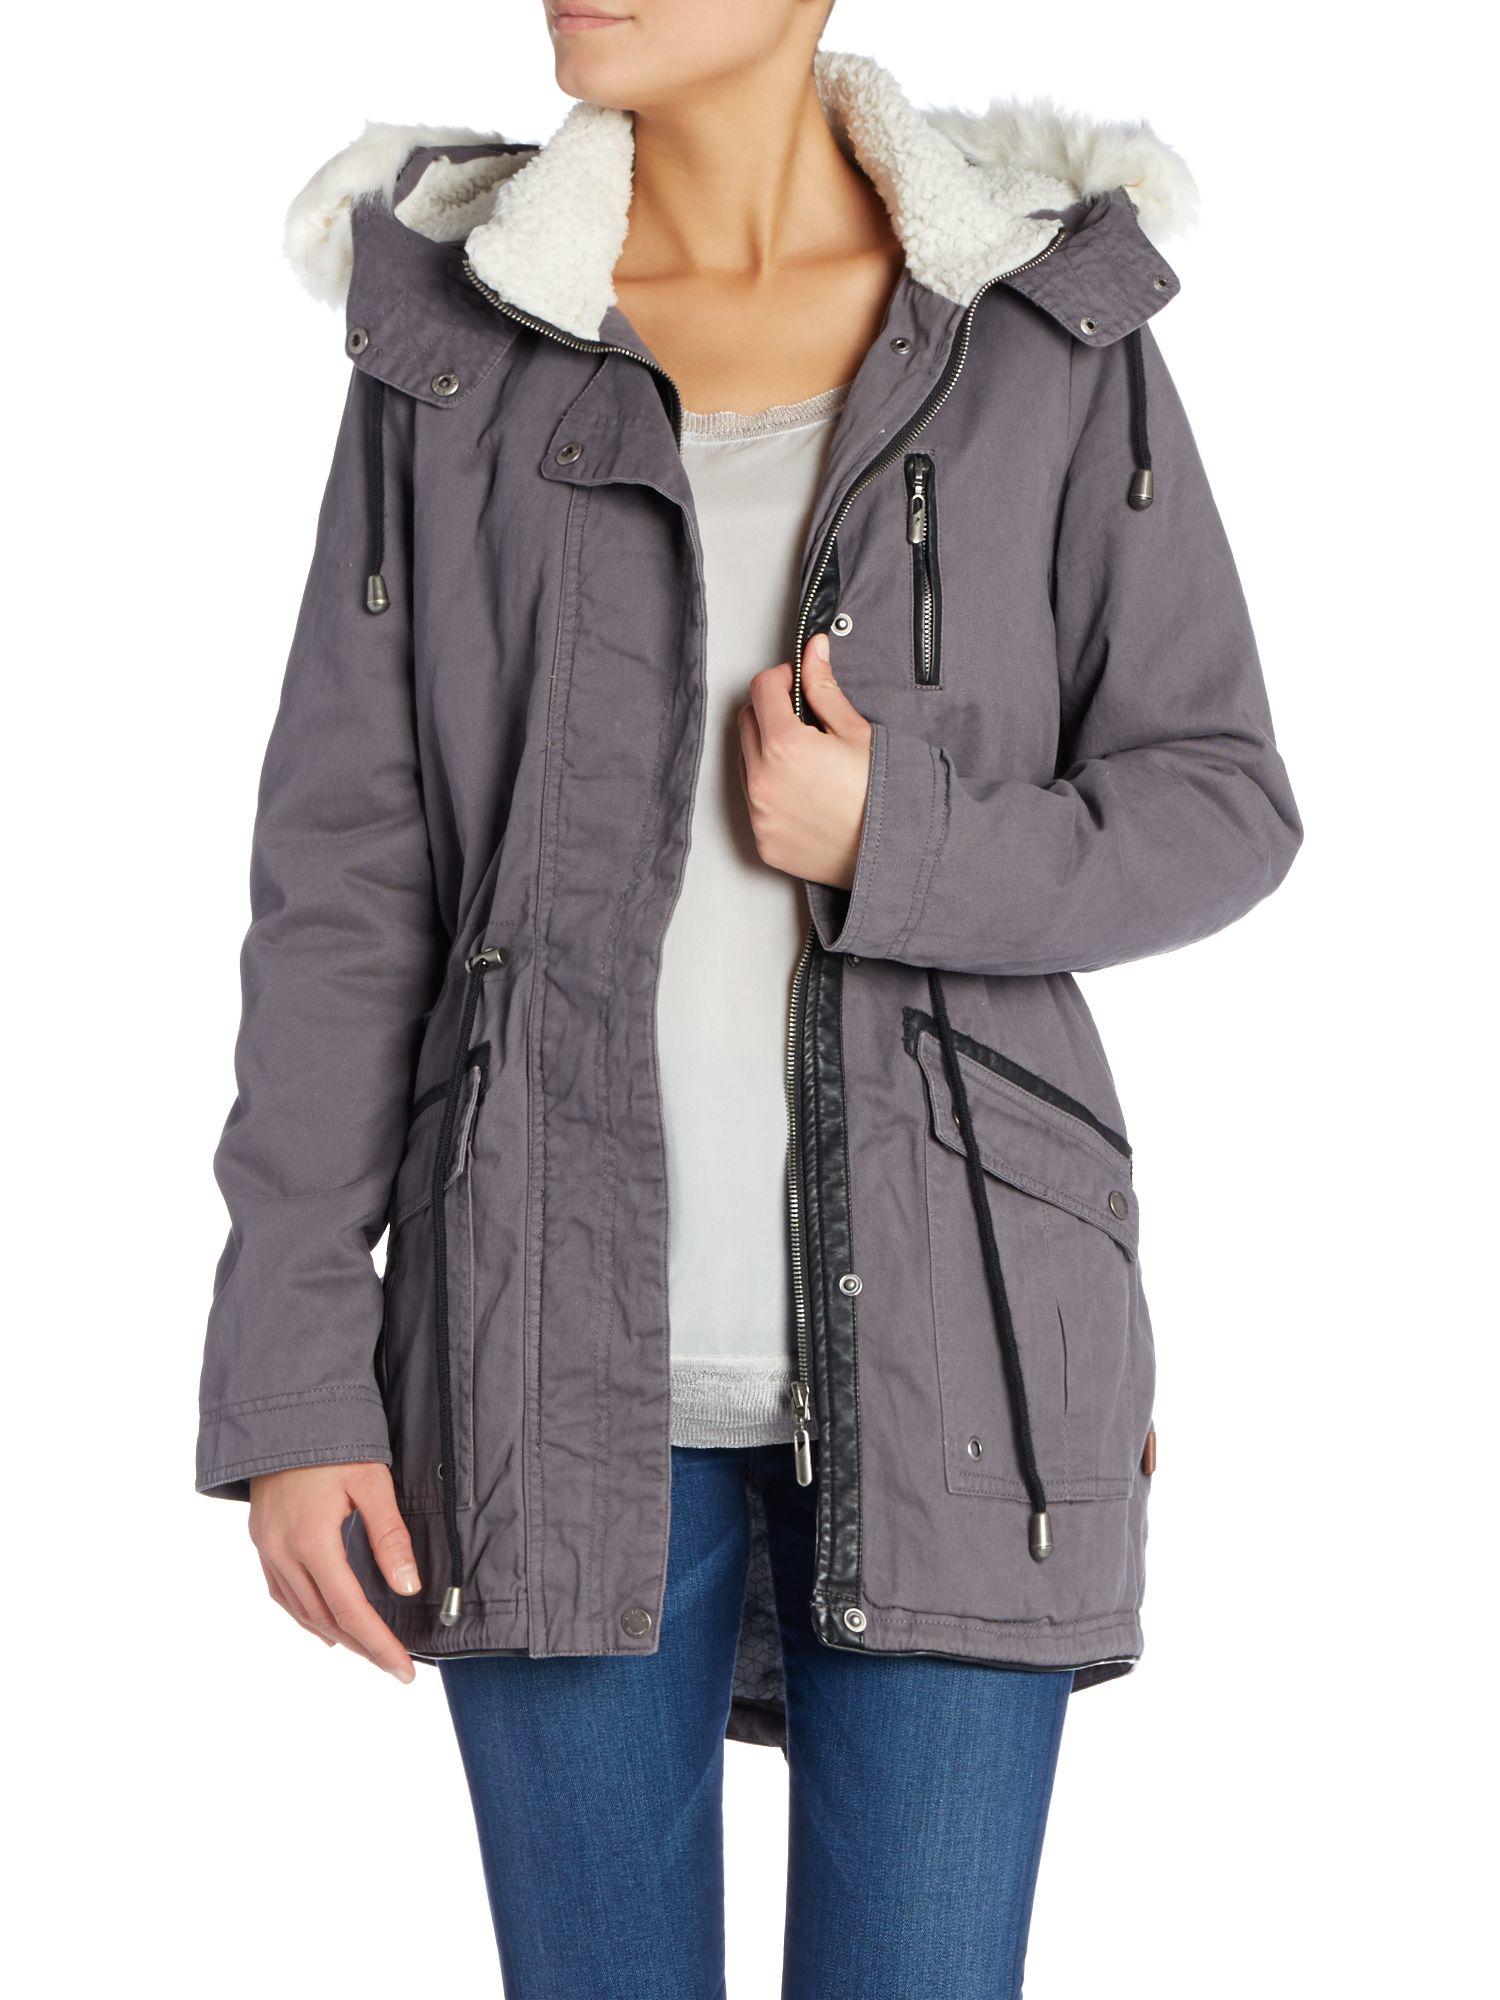 Bellfield Parka With Detachable Faux Fur Hood in Gray | Lyst